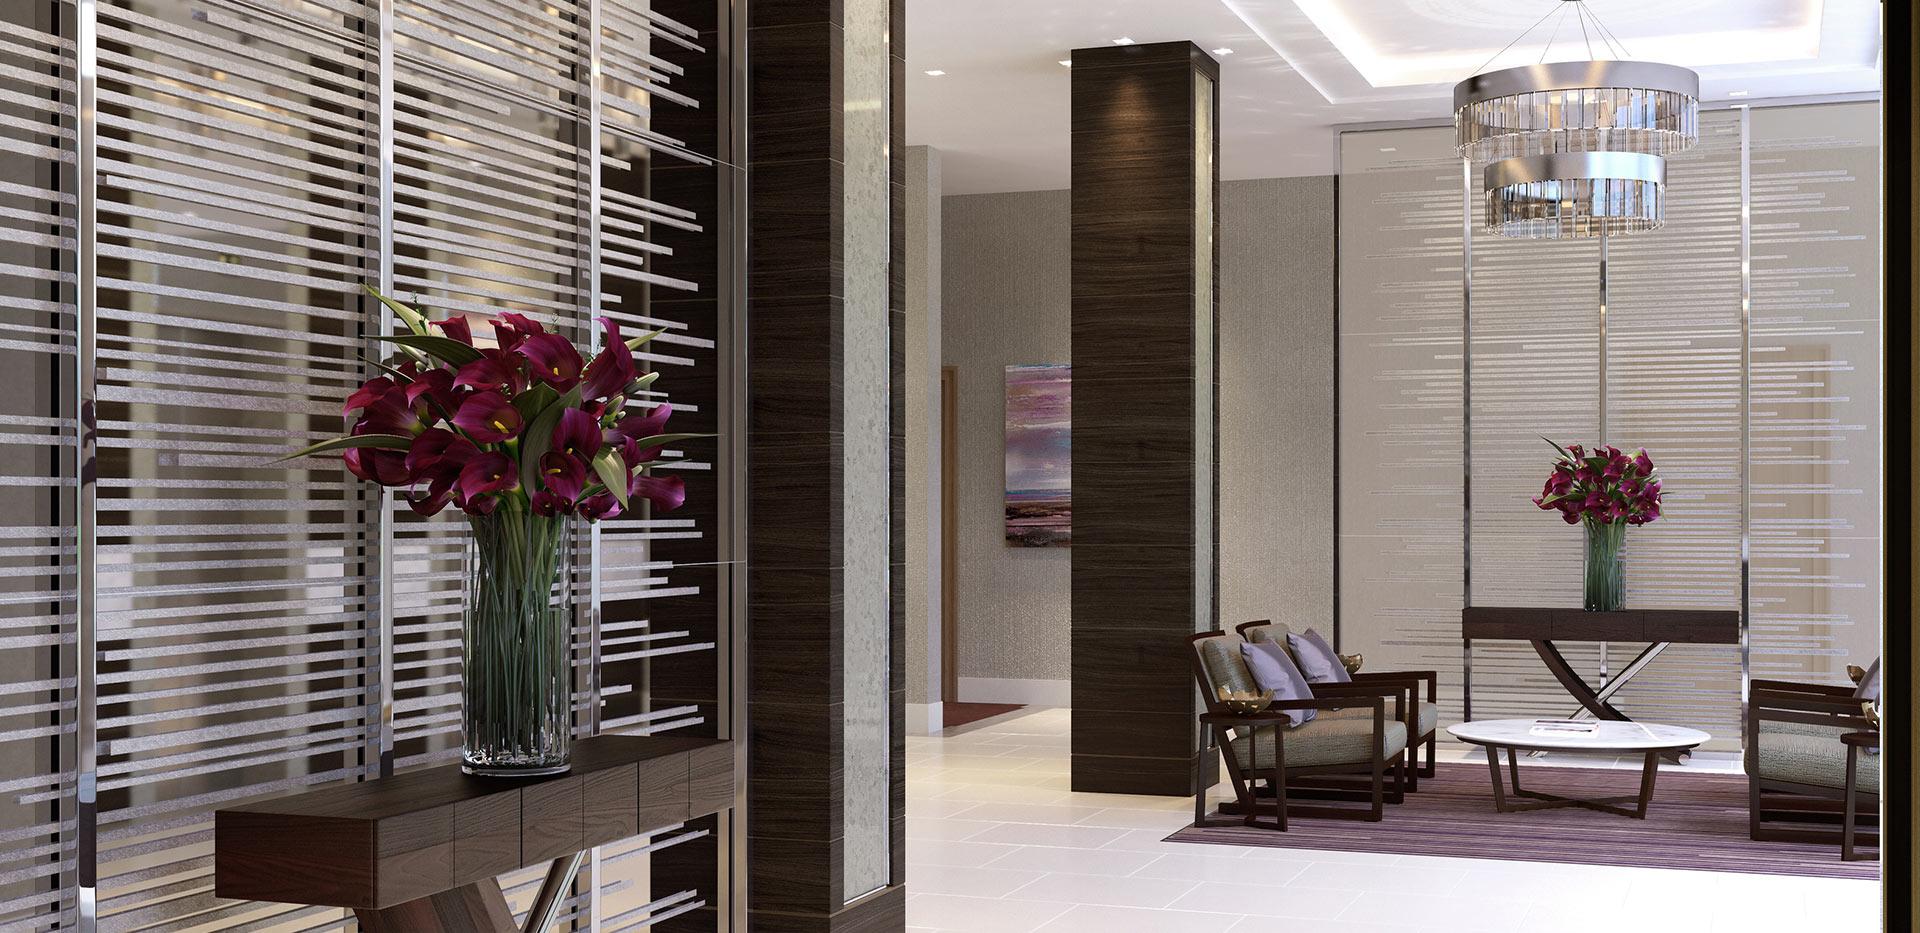 St Edward, Kensington Row, Thomas Earle House, Show Apartment, Interior, Bedroom 3